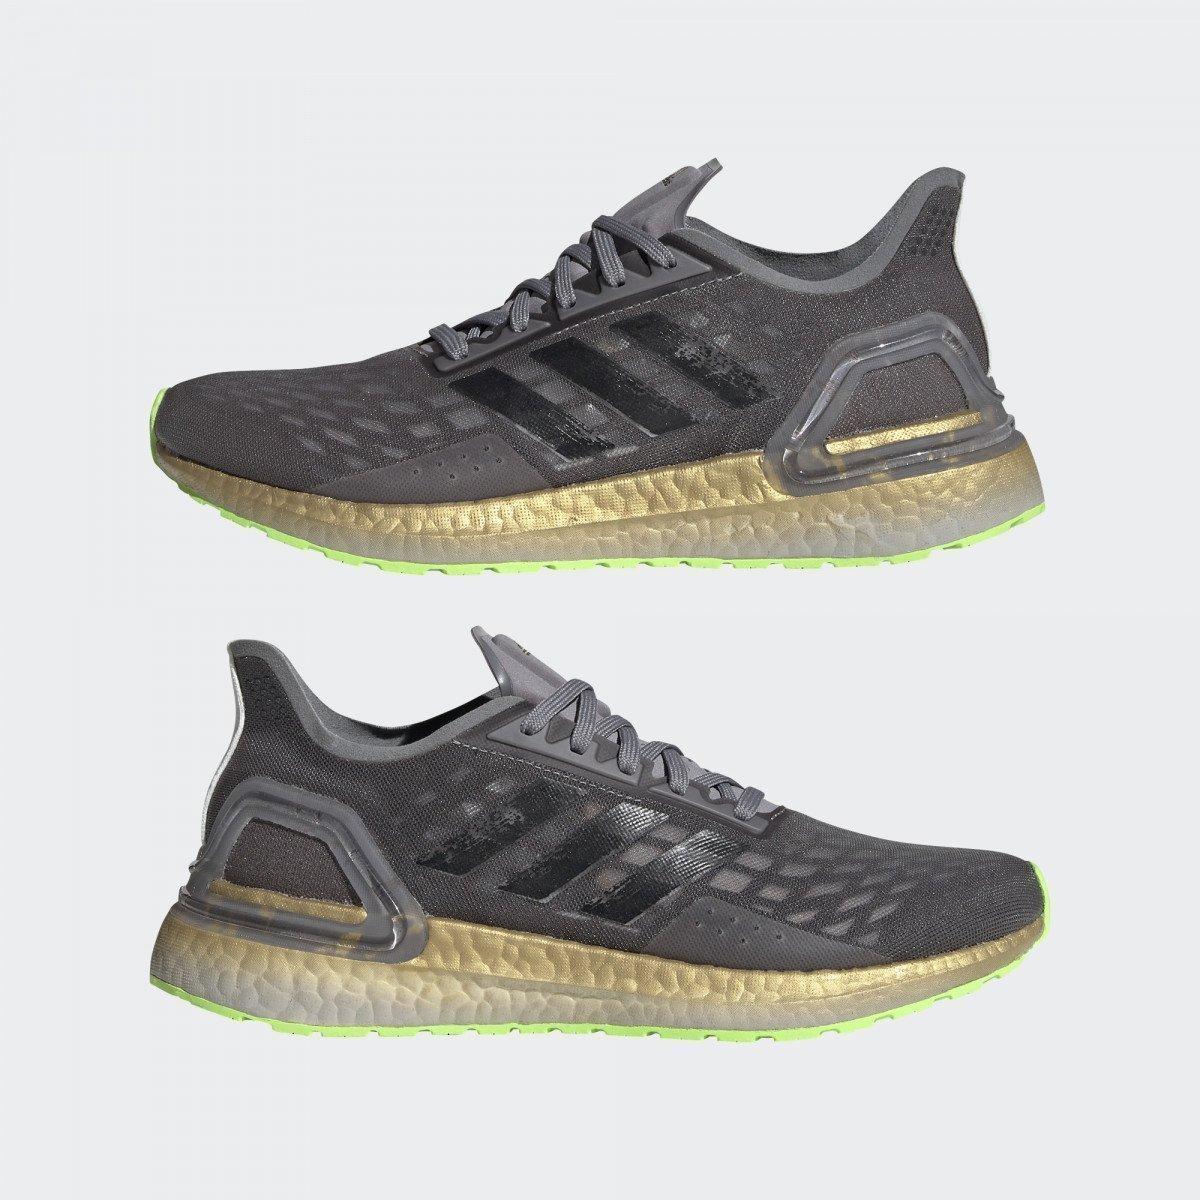 Adidas ultraboost PB skor grå (44 = ca 29 cm). Helt nya!